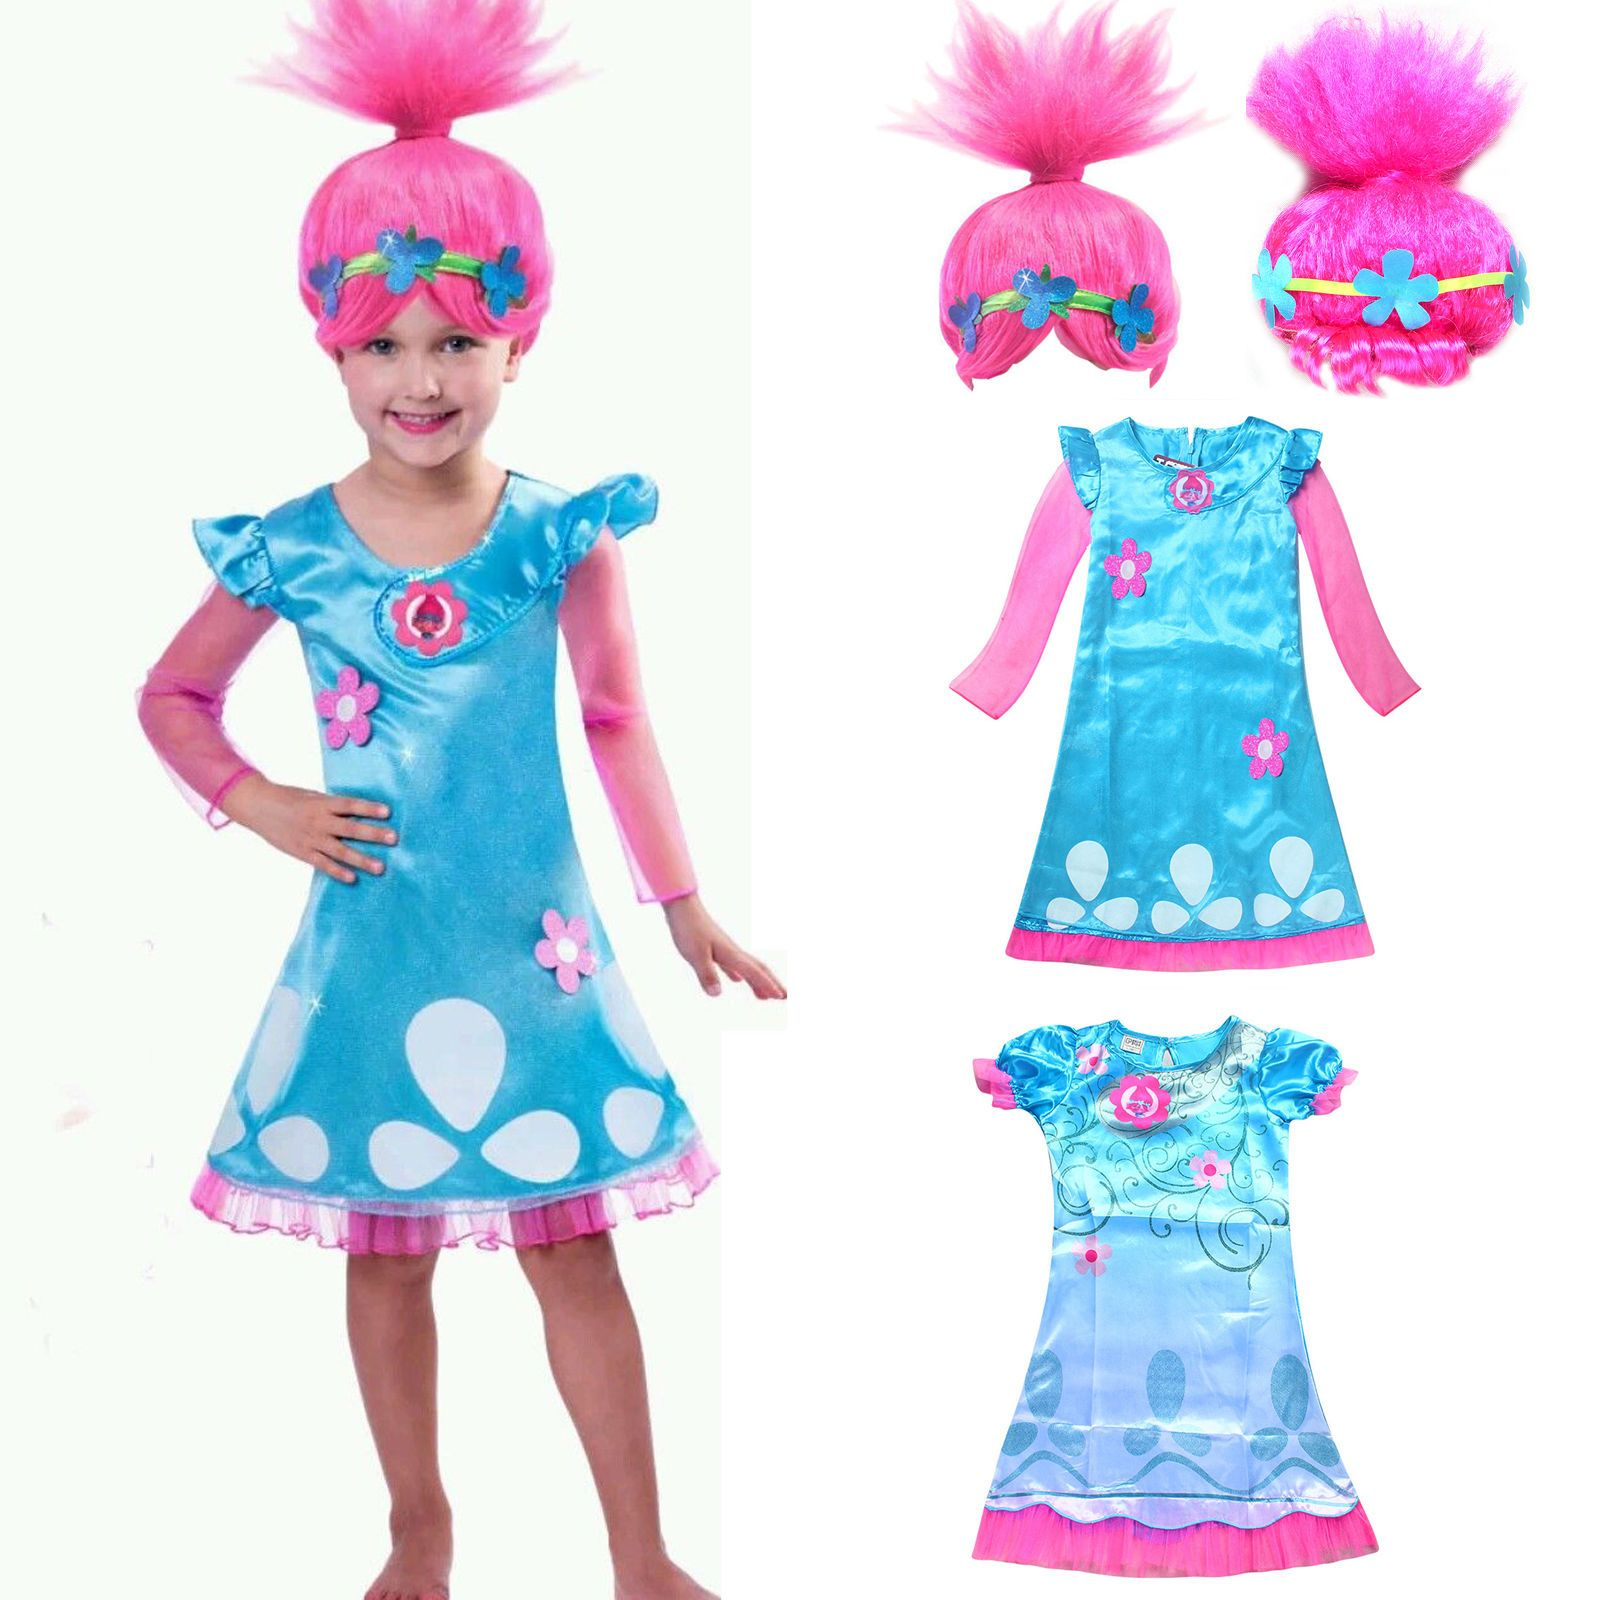 Toddler Kid Girl Wig Trolls Poppy Fancy Dress Costume Cosplay Party ...